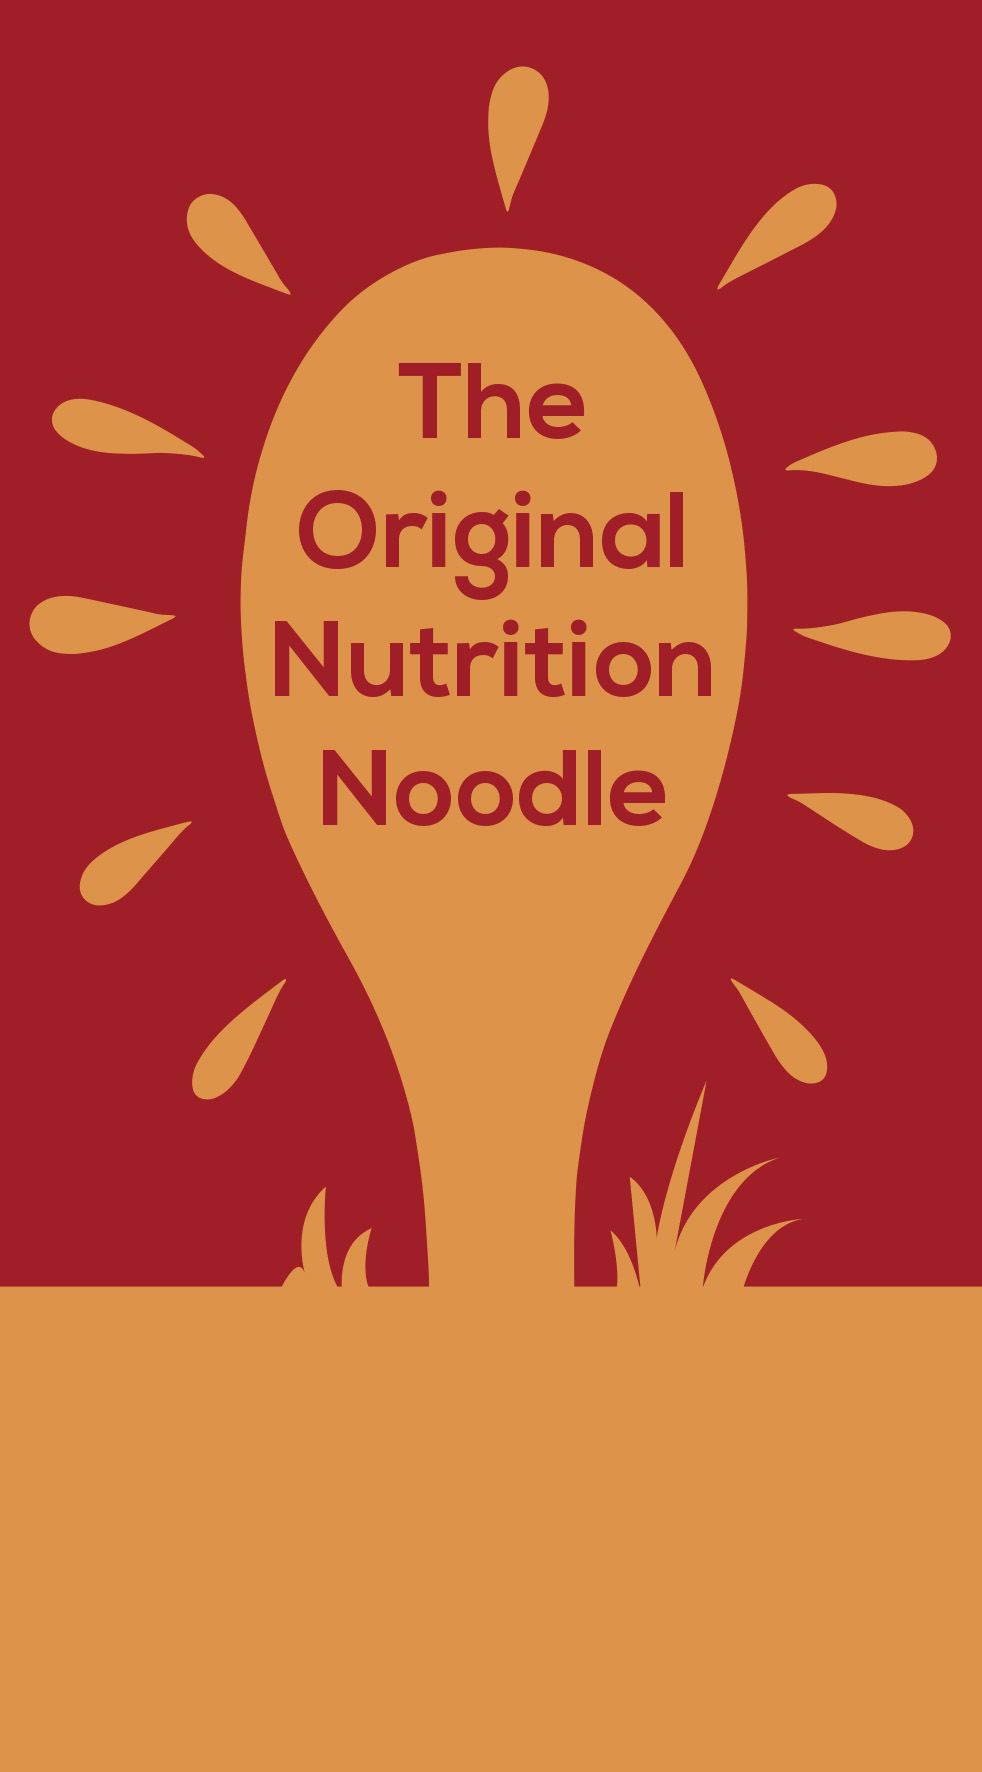 Packaging Design Agency Brand Design Our Revolution Brand Logo Brand Strategy Brand Innovation Food Packaging Food Design Food Brand Food Branding Food innovation Packaging Innovation